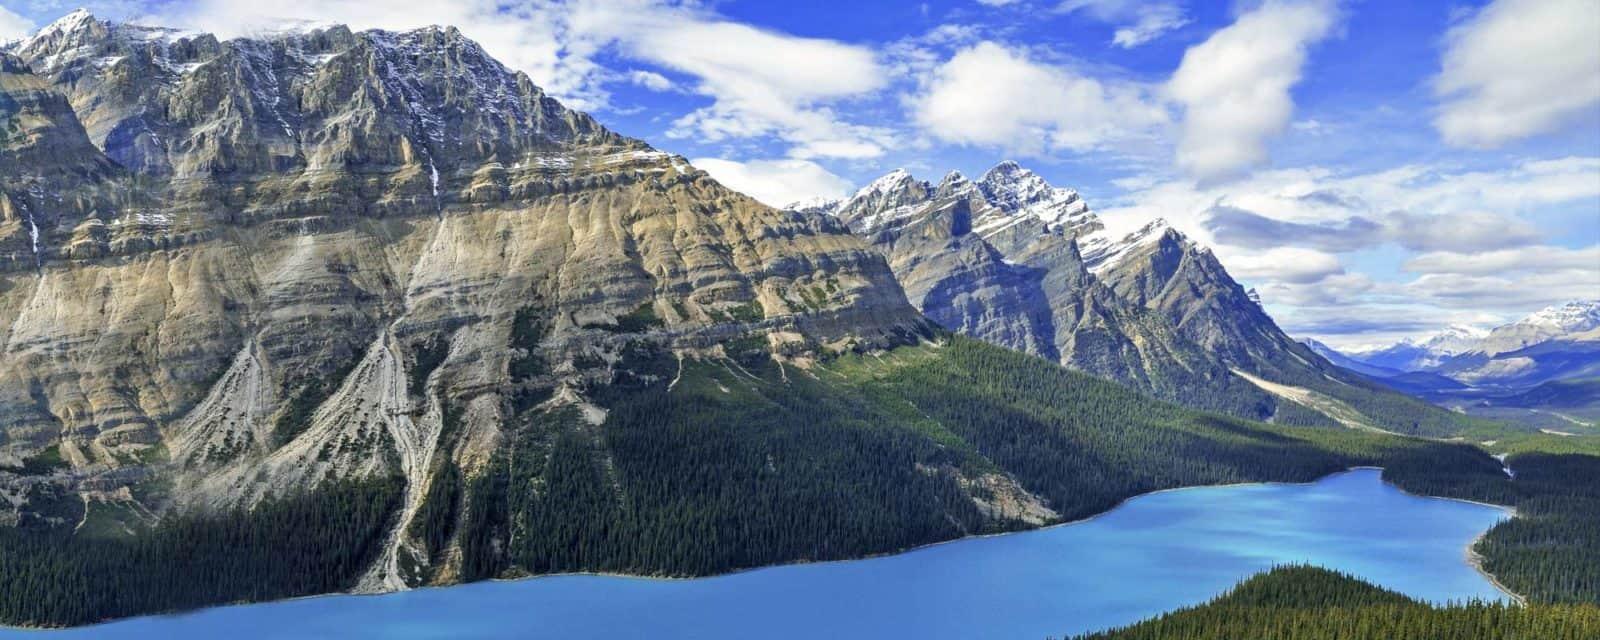 Kanada Rundreise - Peyto Lake im Banff Nationalpark